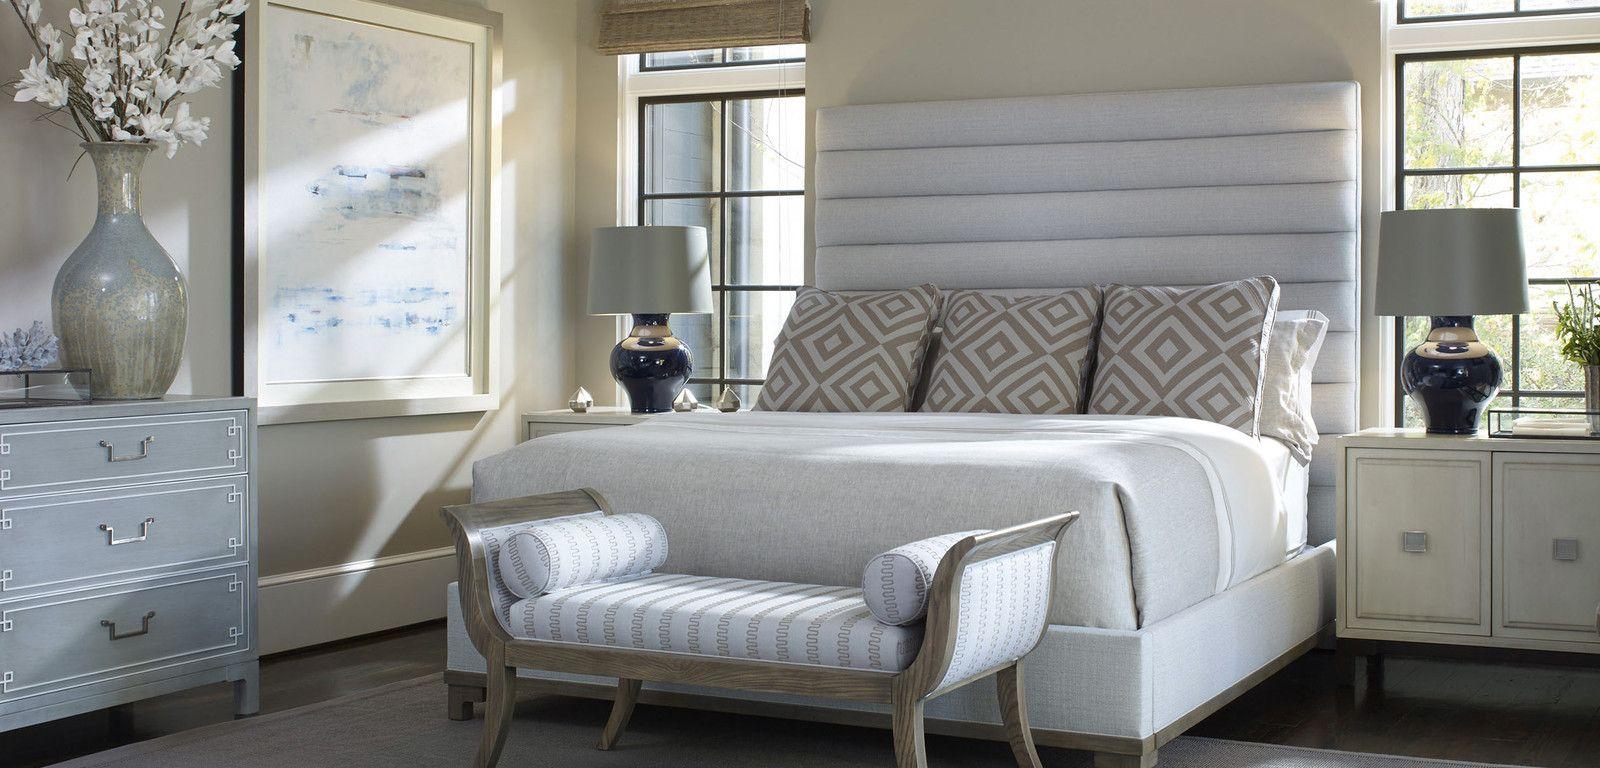 Custom chanel upholstered bed, Bed Down Furniture Atlanta